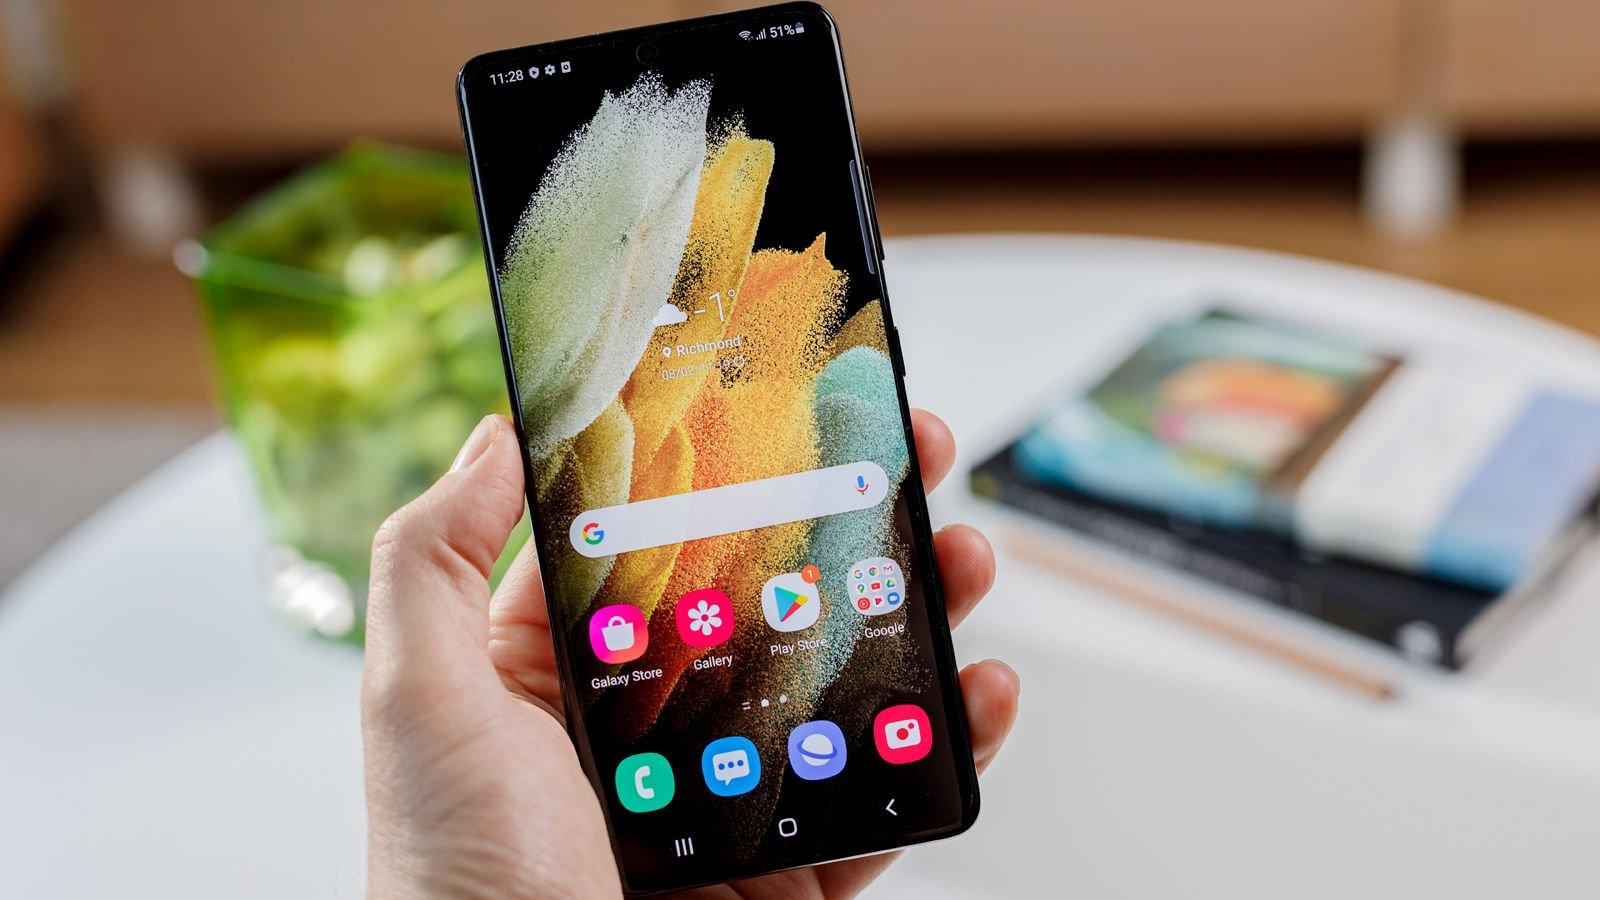 Samsung Galaxy S21 Ultra front handheld